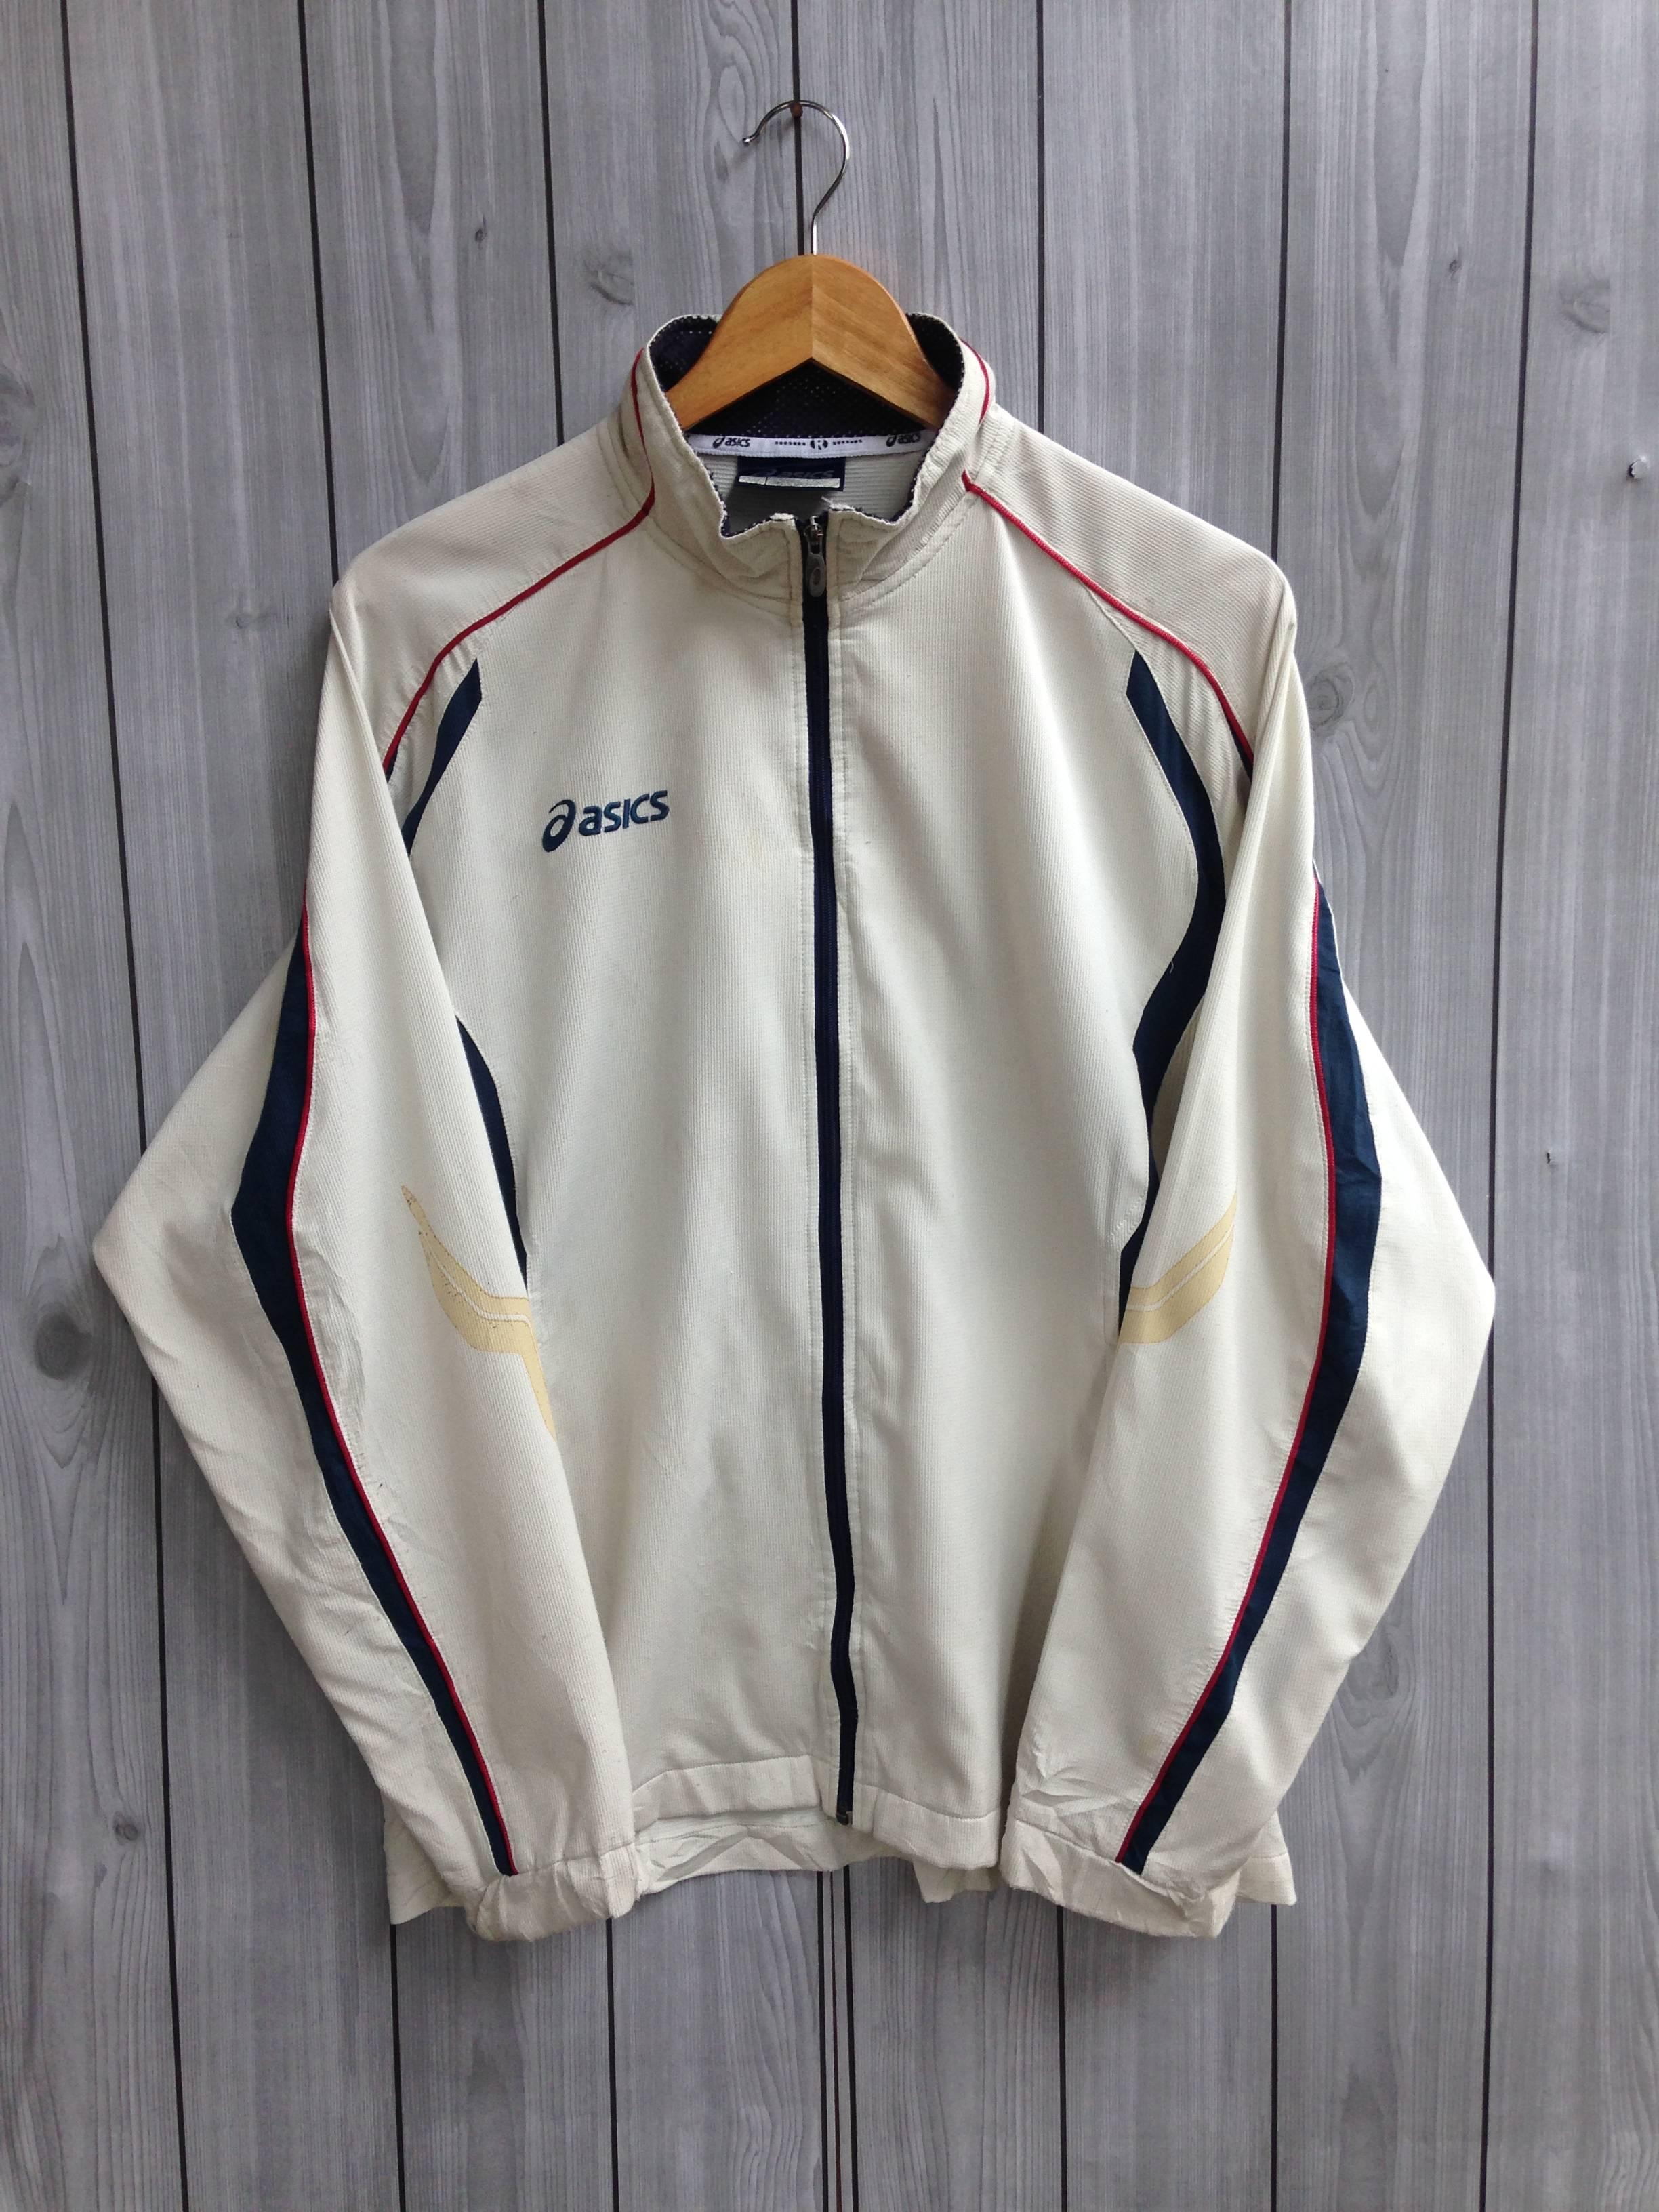 Asics Asics Windbreaker Jacket